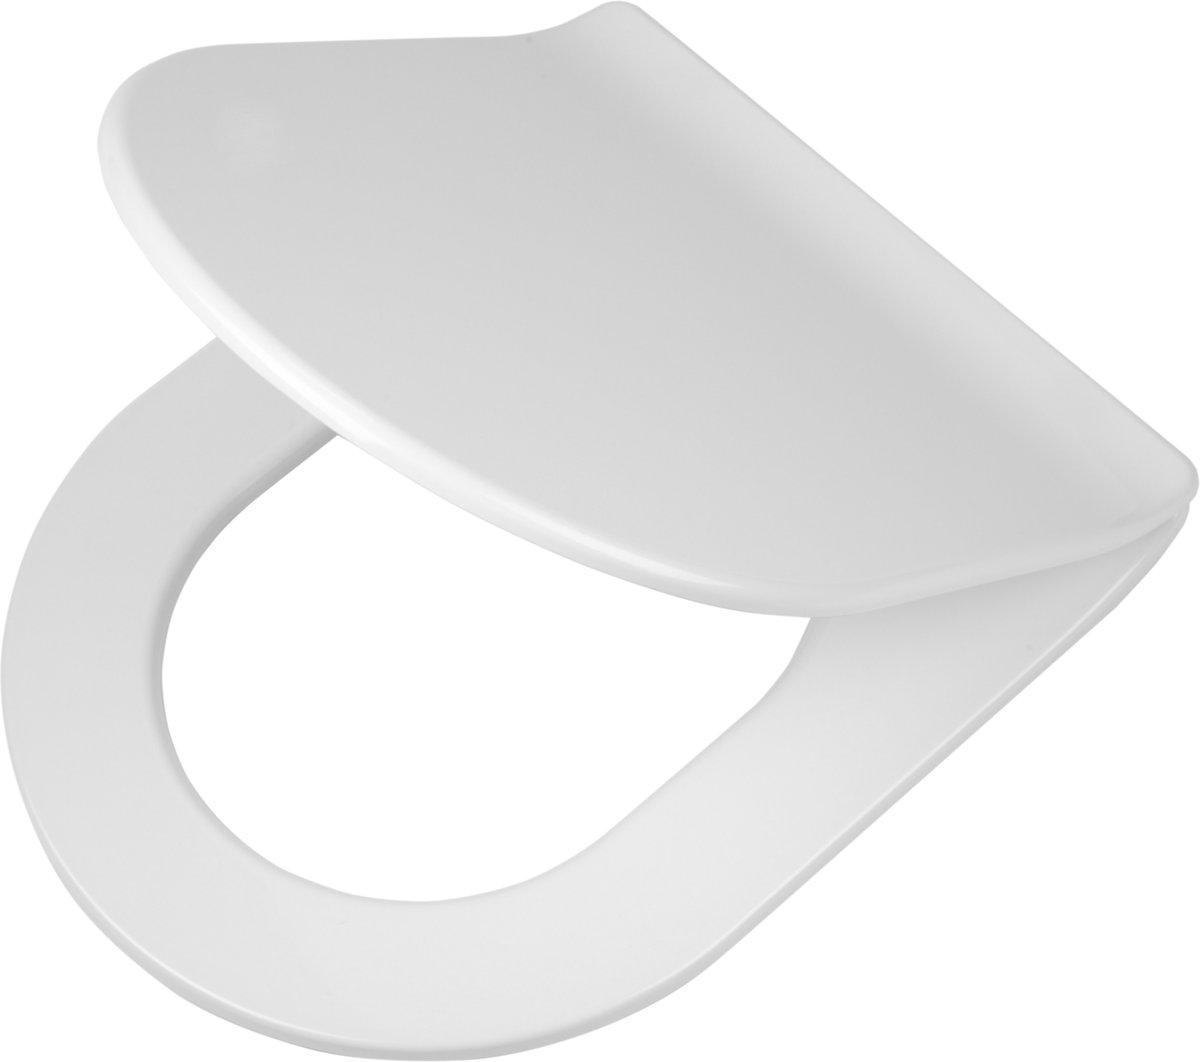 Tiger Carter wc-bril met D-vorm - Softclose - Duroplast - Afklikbaar - Wit kopen